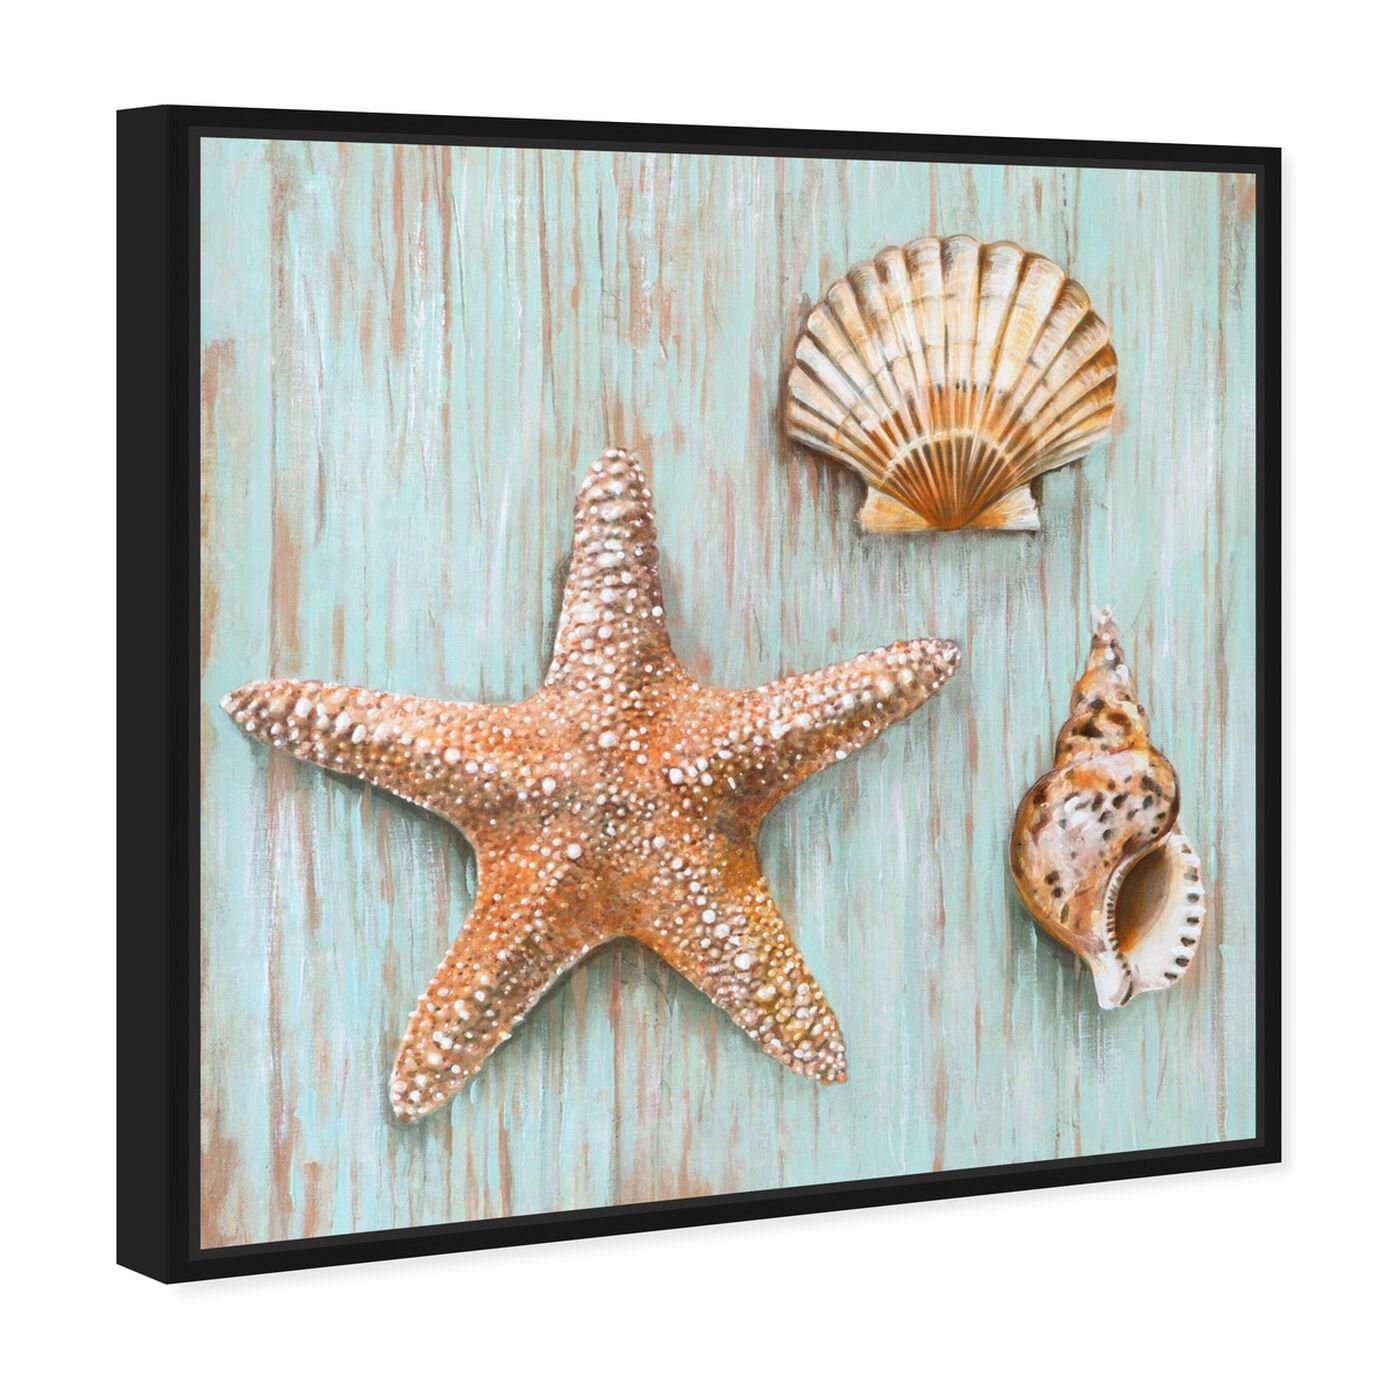 Angled view of SAI - Maritimas Treasures featuring nautical and coastal and marine life art.